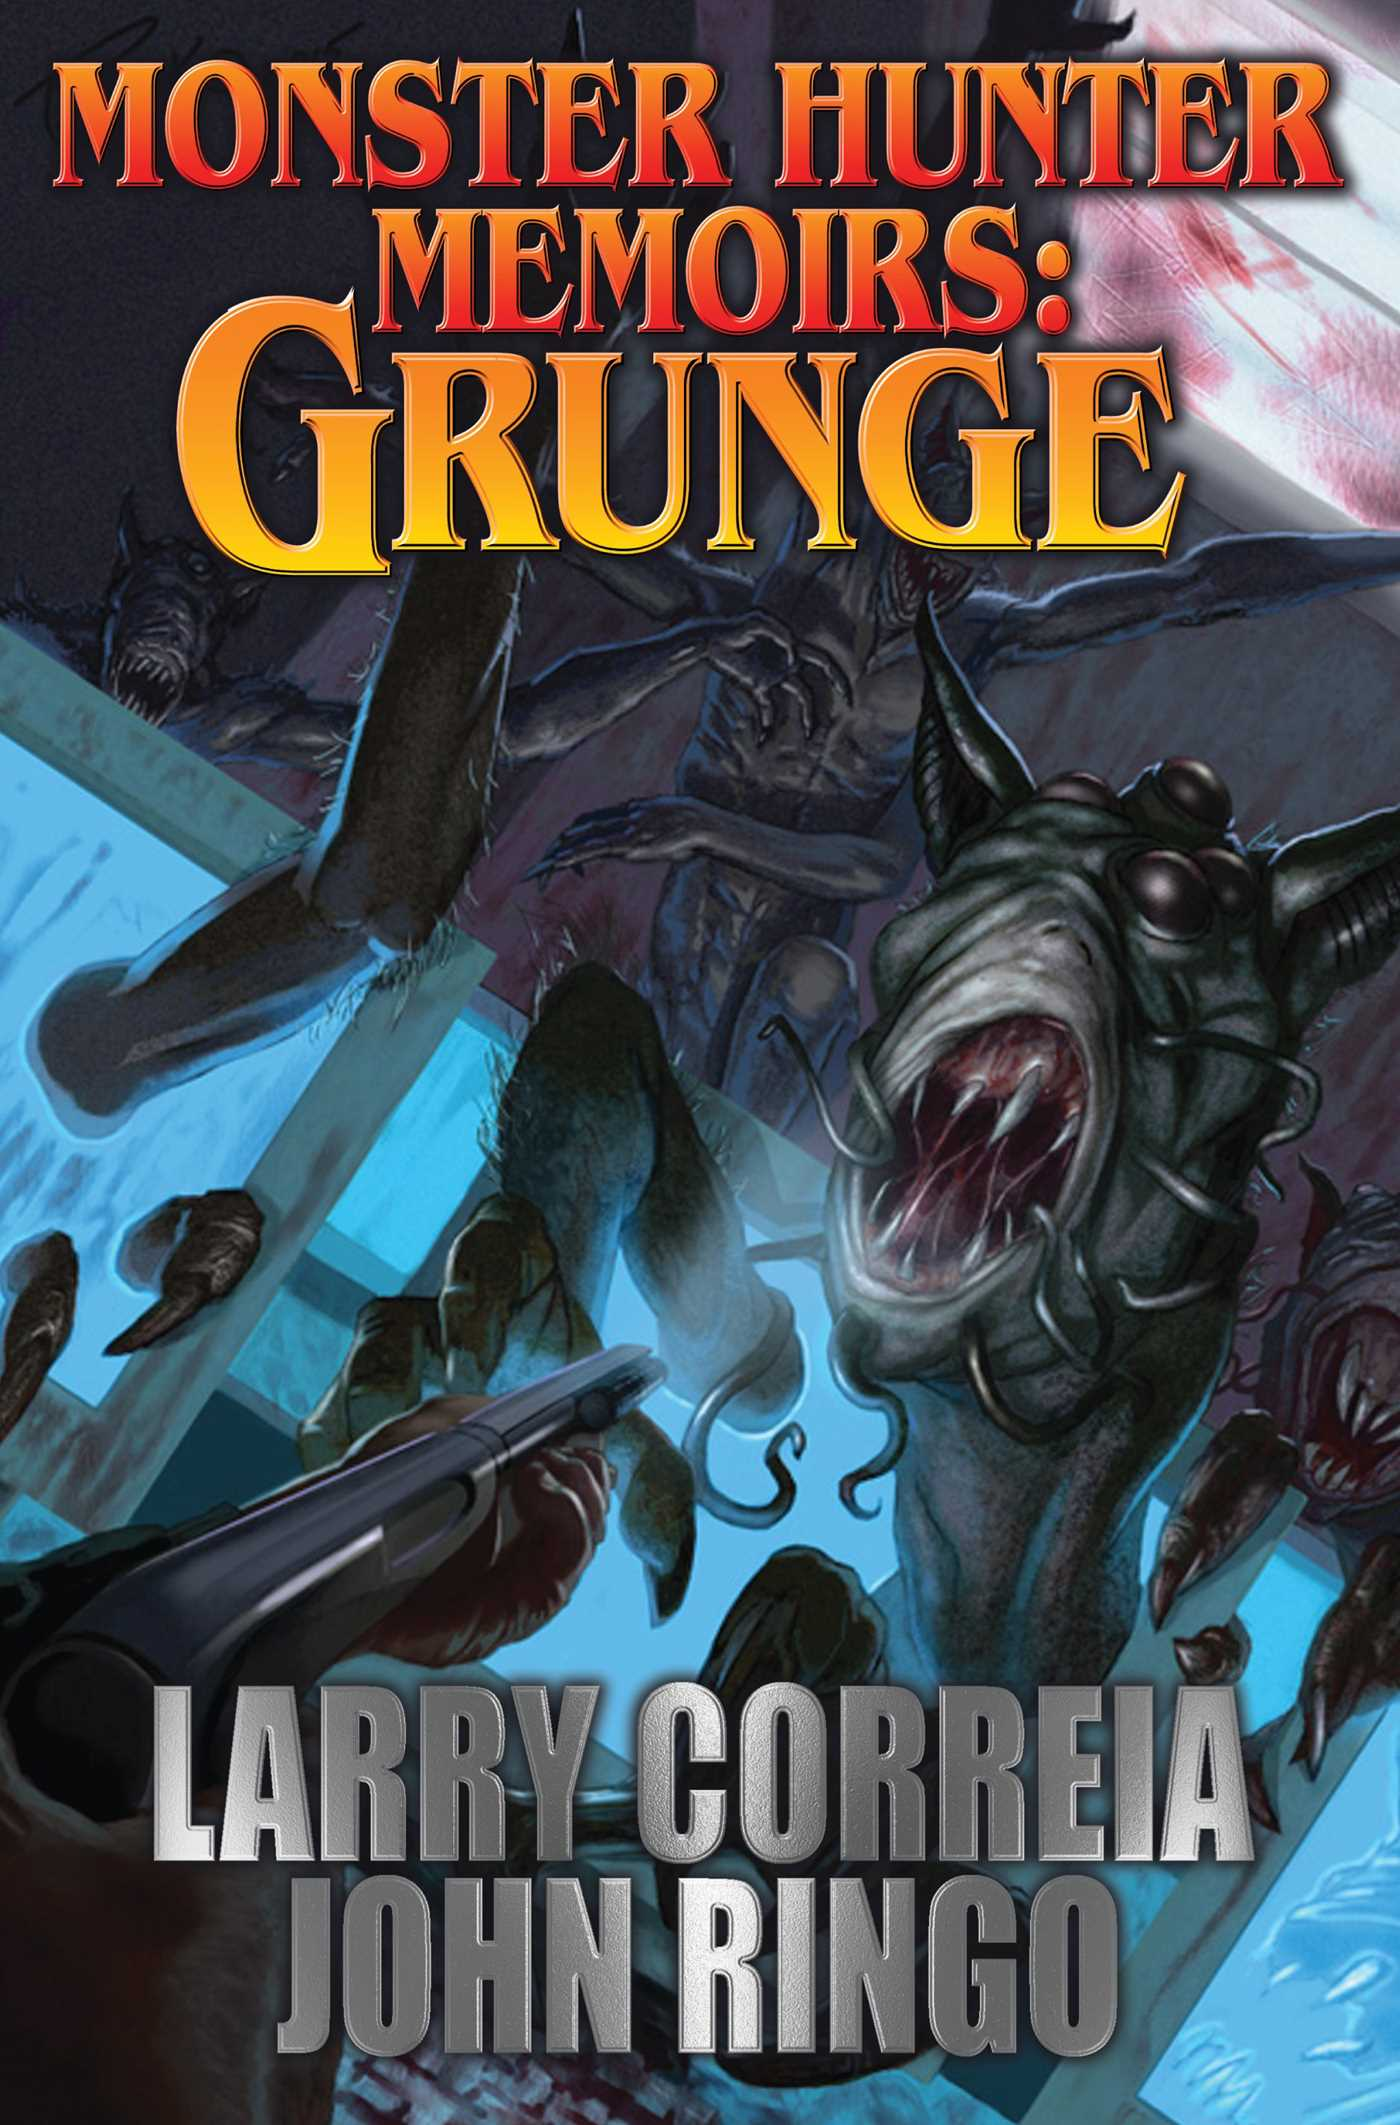 """Monster Hunter Memoirs - Grunge"" by Larry Correia and John Ringo."